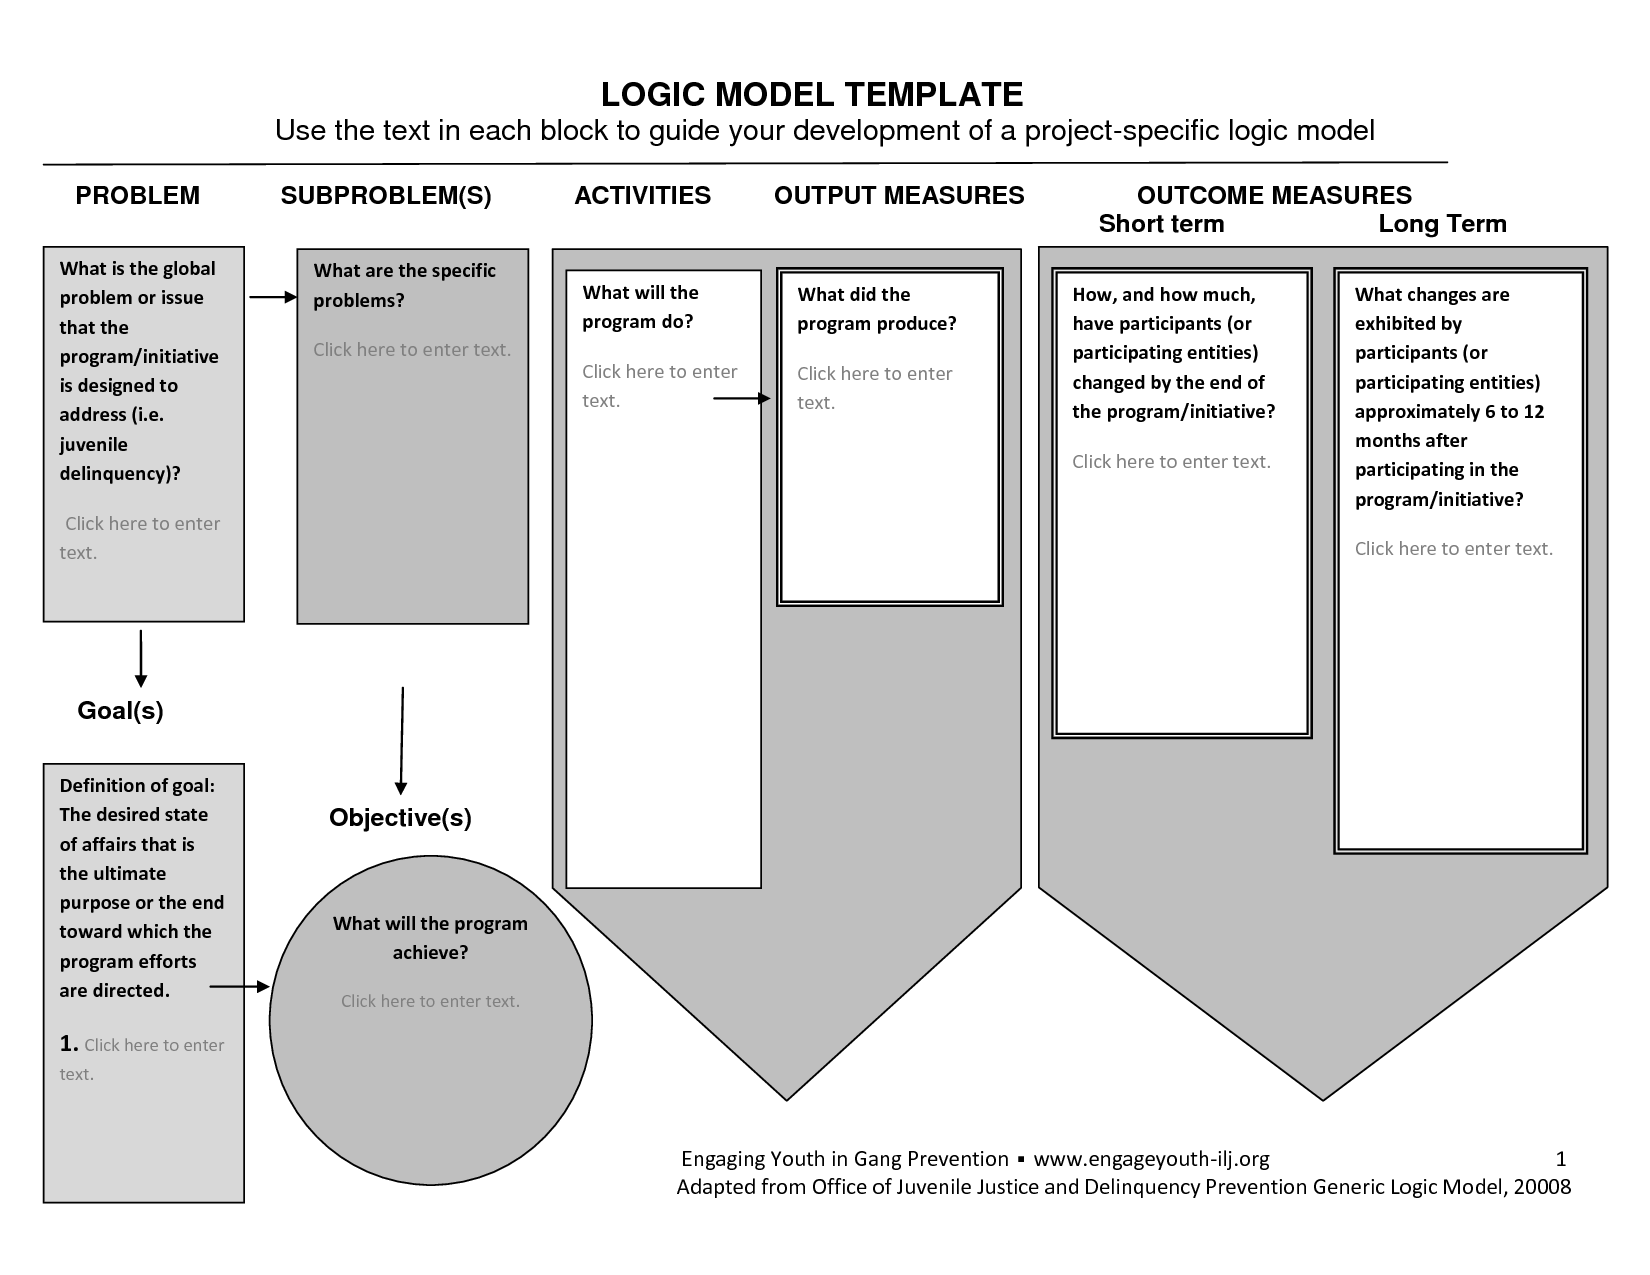 logicmodeltemplateqvyitxtupng 1650 1275 – Logic Model Template